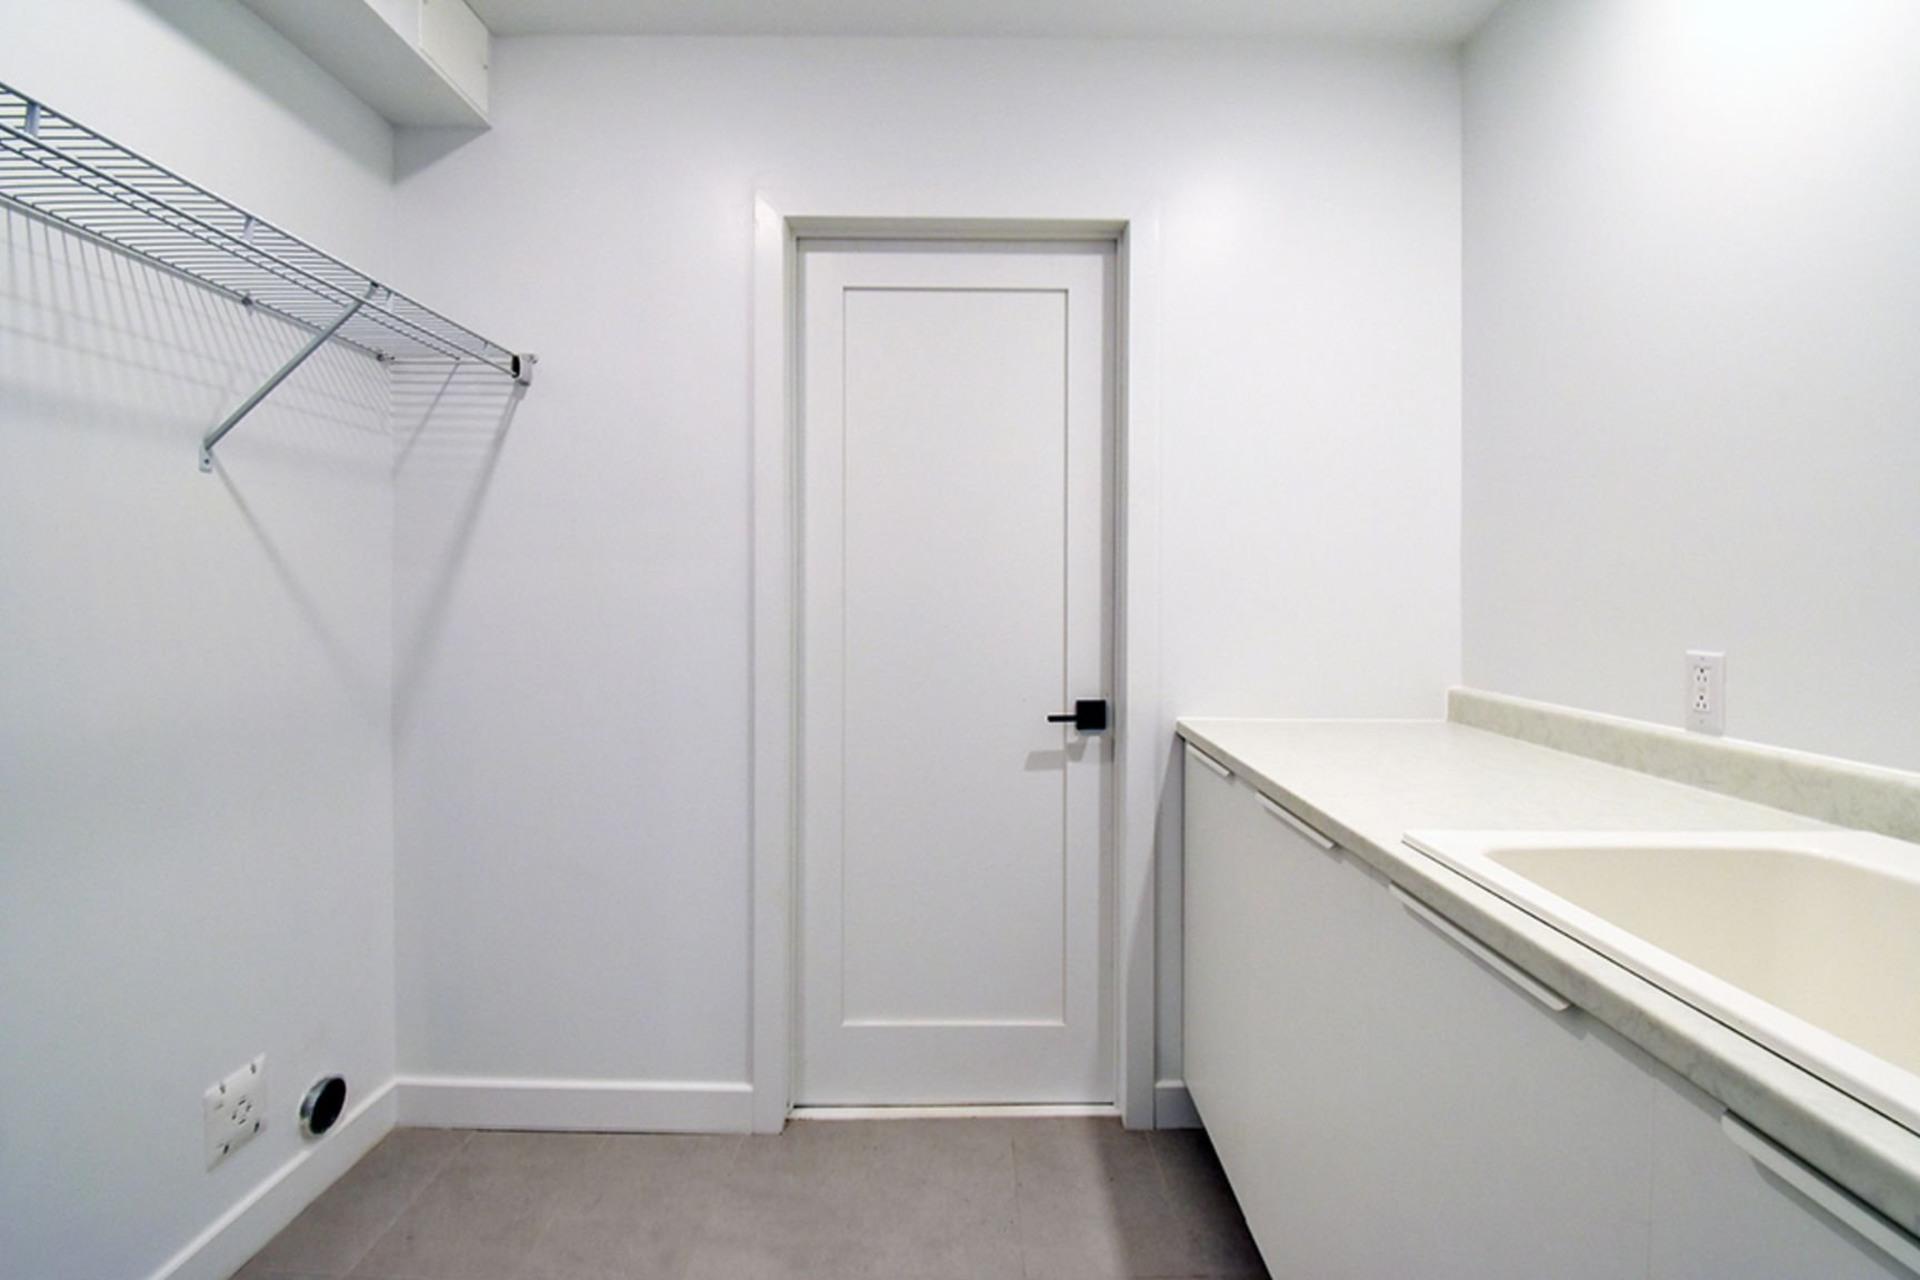 image 21 - Apartment For sale Le Vieux-Longueuil Longueuil  - 9 rooms